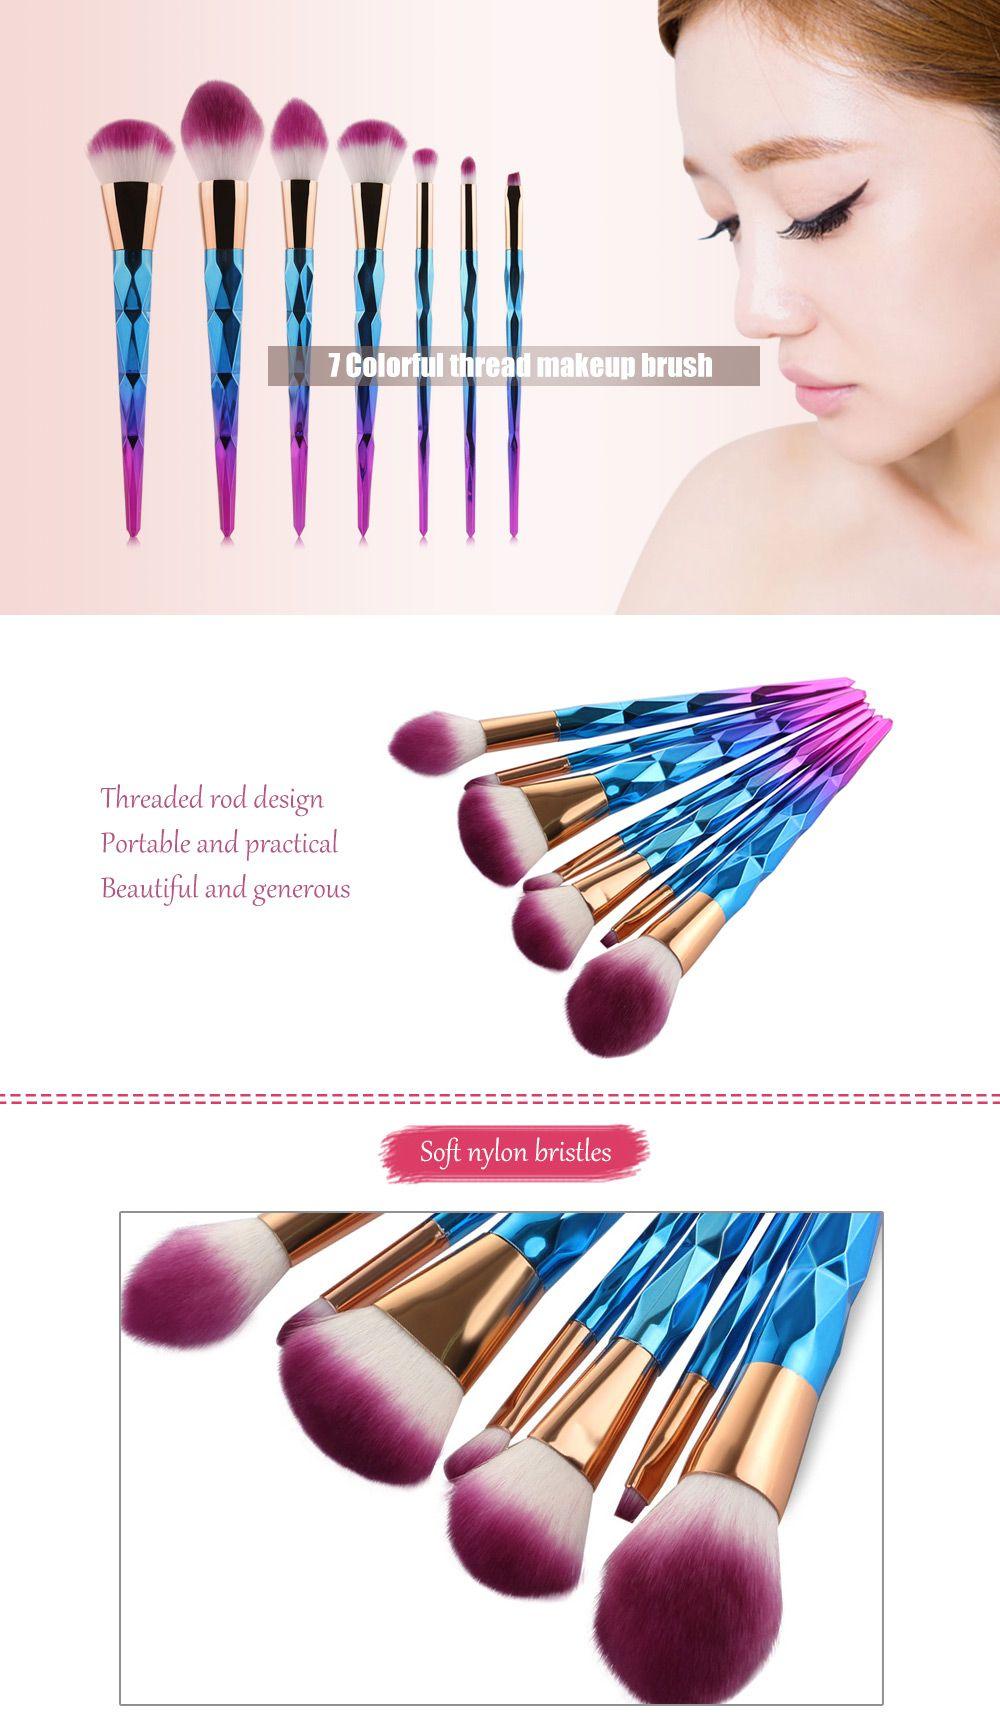 MAANGE 7pcs Makeup Cosmetic Brushes Set Sale, Price